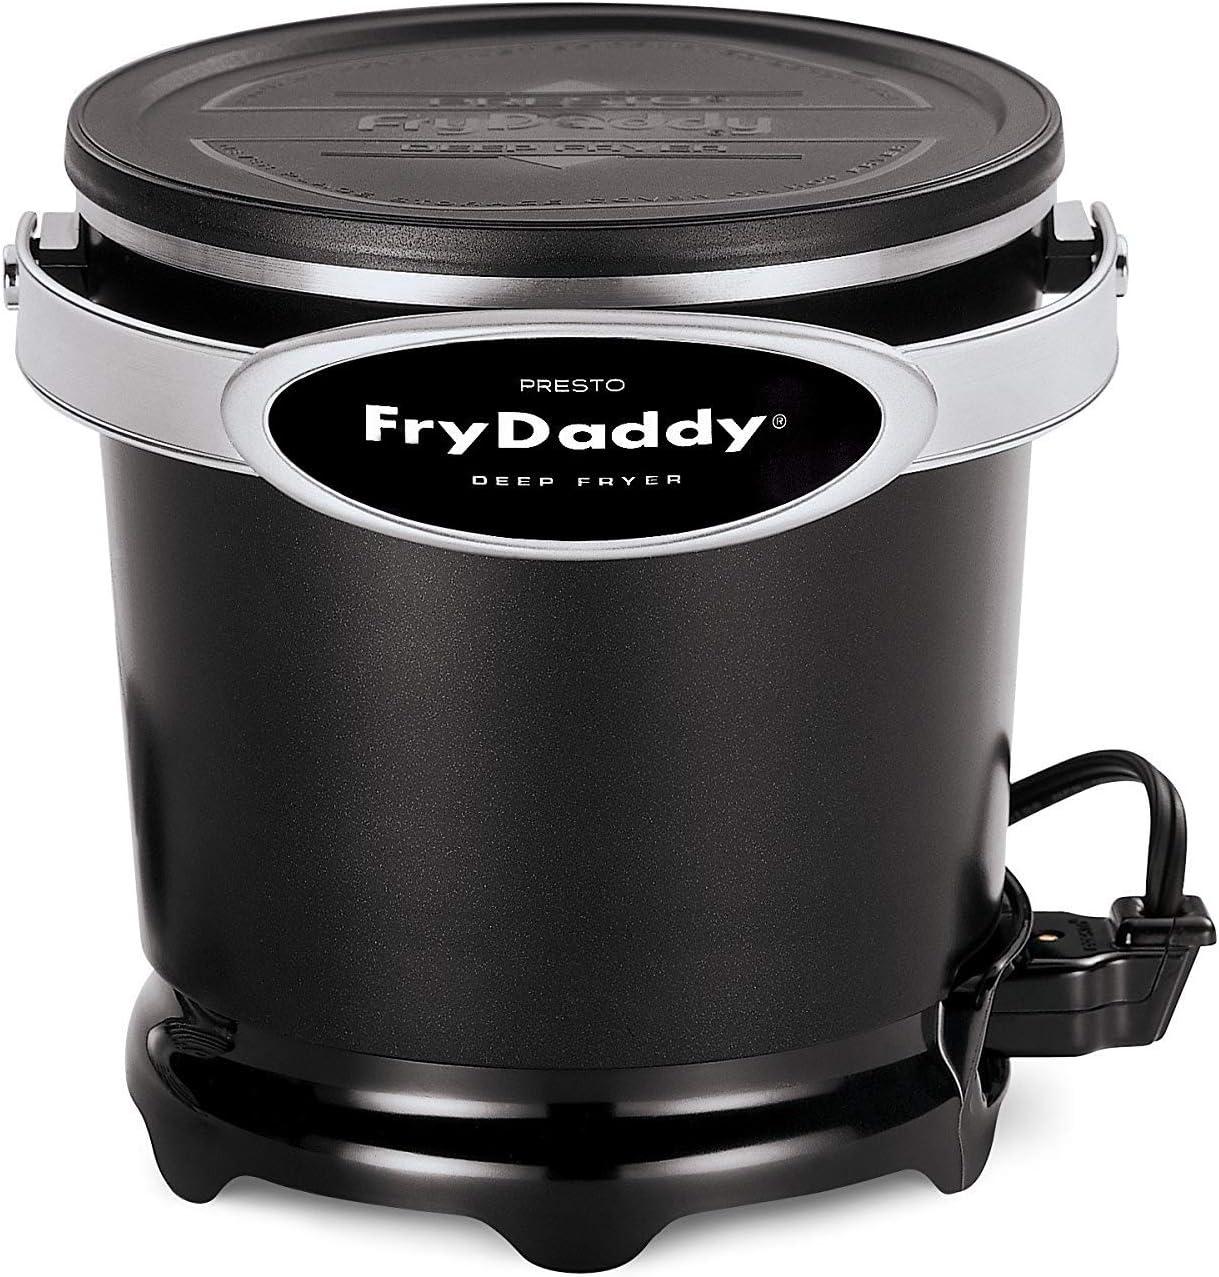 Presto 05420 FryDaddy Electric Deep Fryer 4 Pack 4 cups